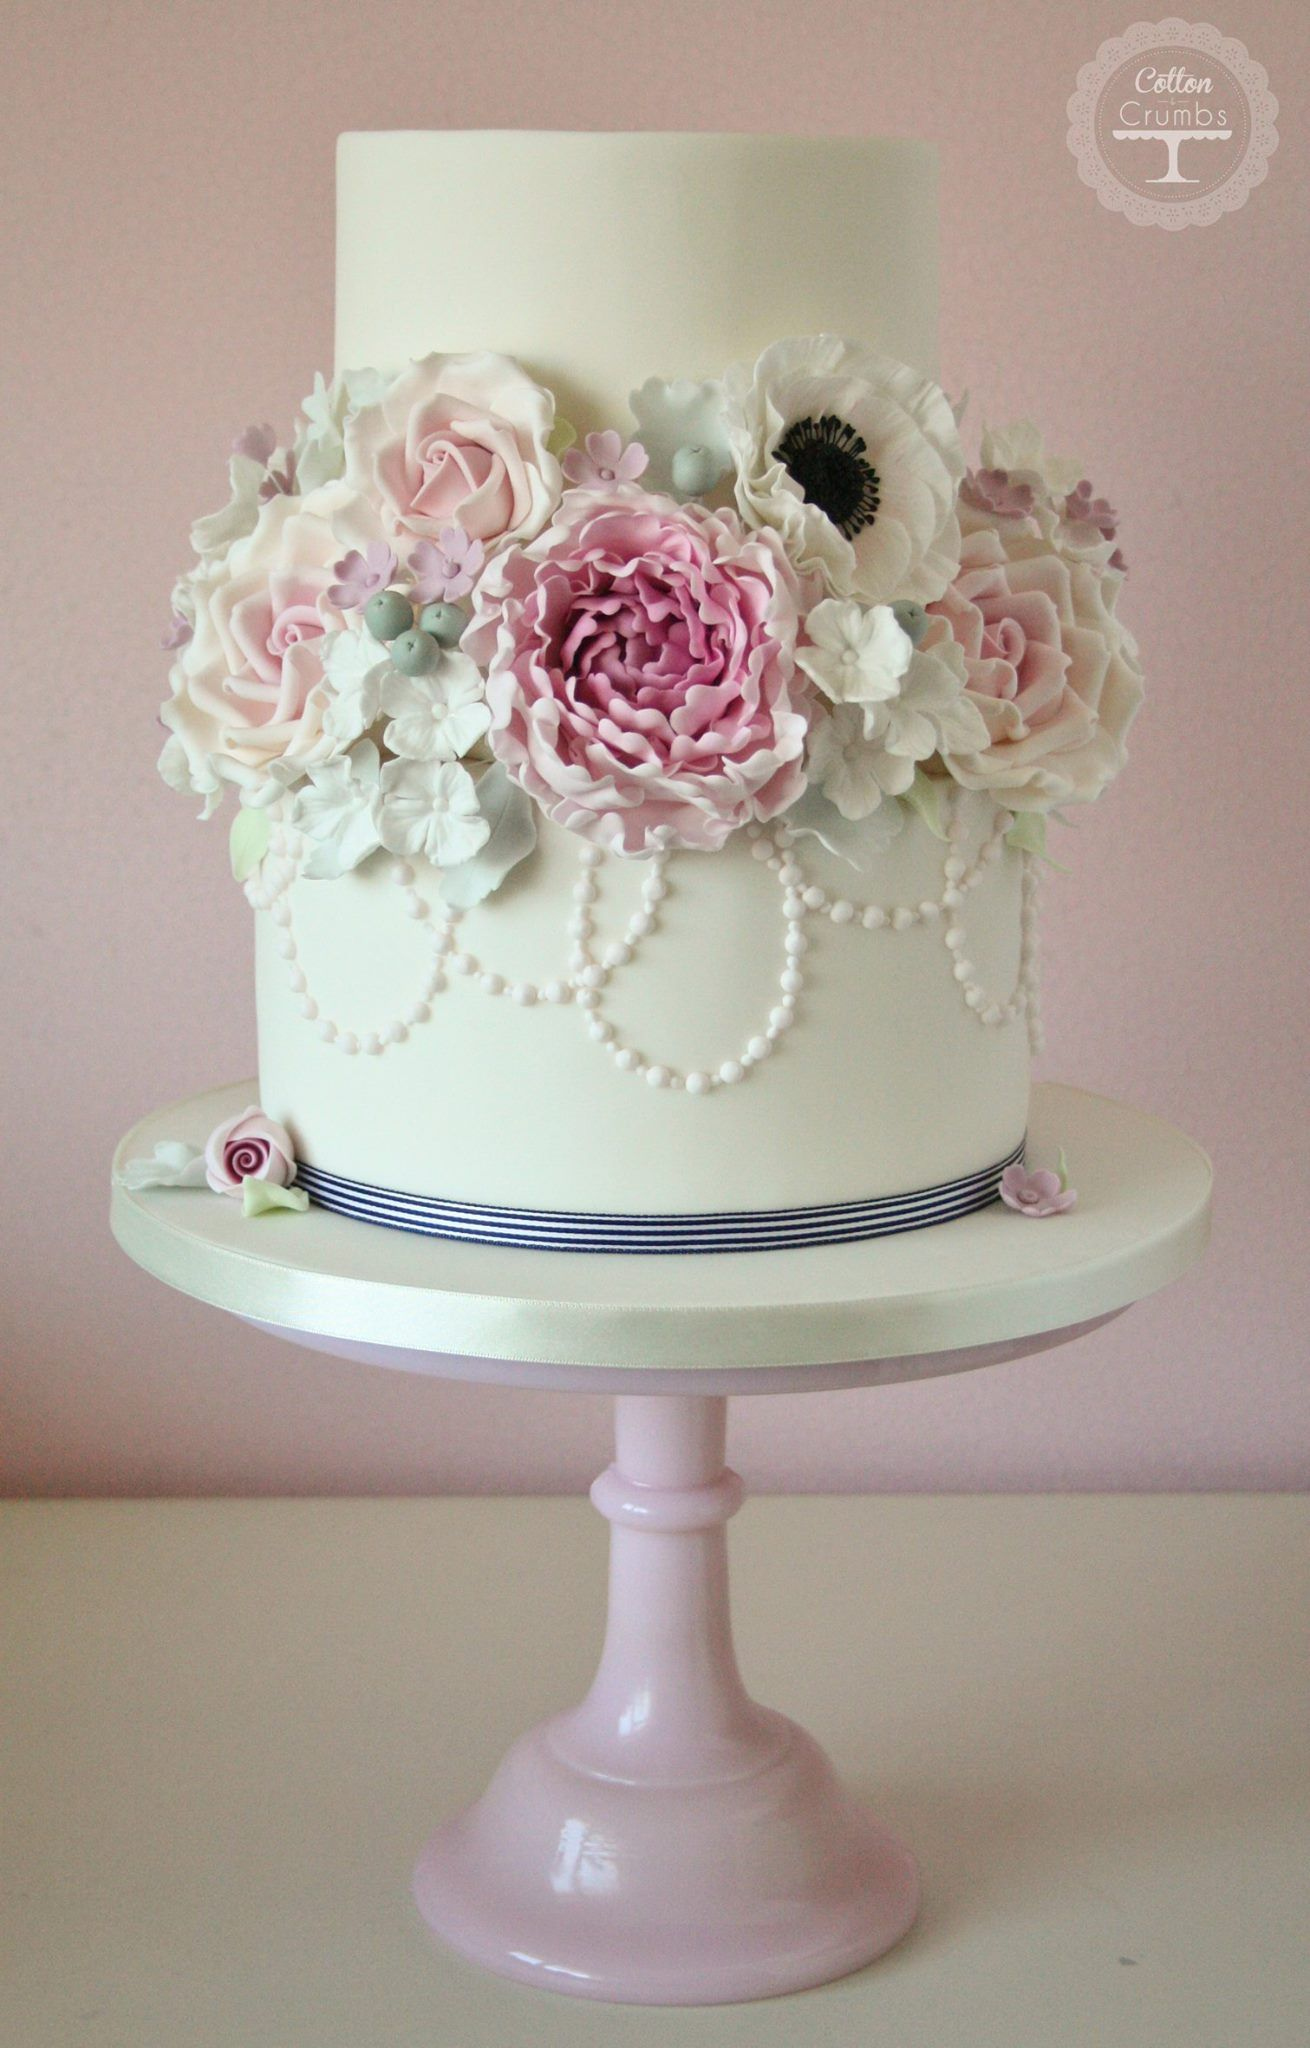 Wedding Cakes With Exceptional Details Modwedding Floral Cake Wedding Cake Inspiration Classy Wedding Cakes